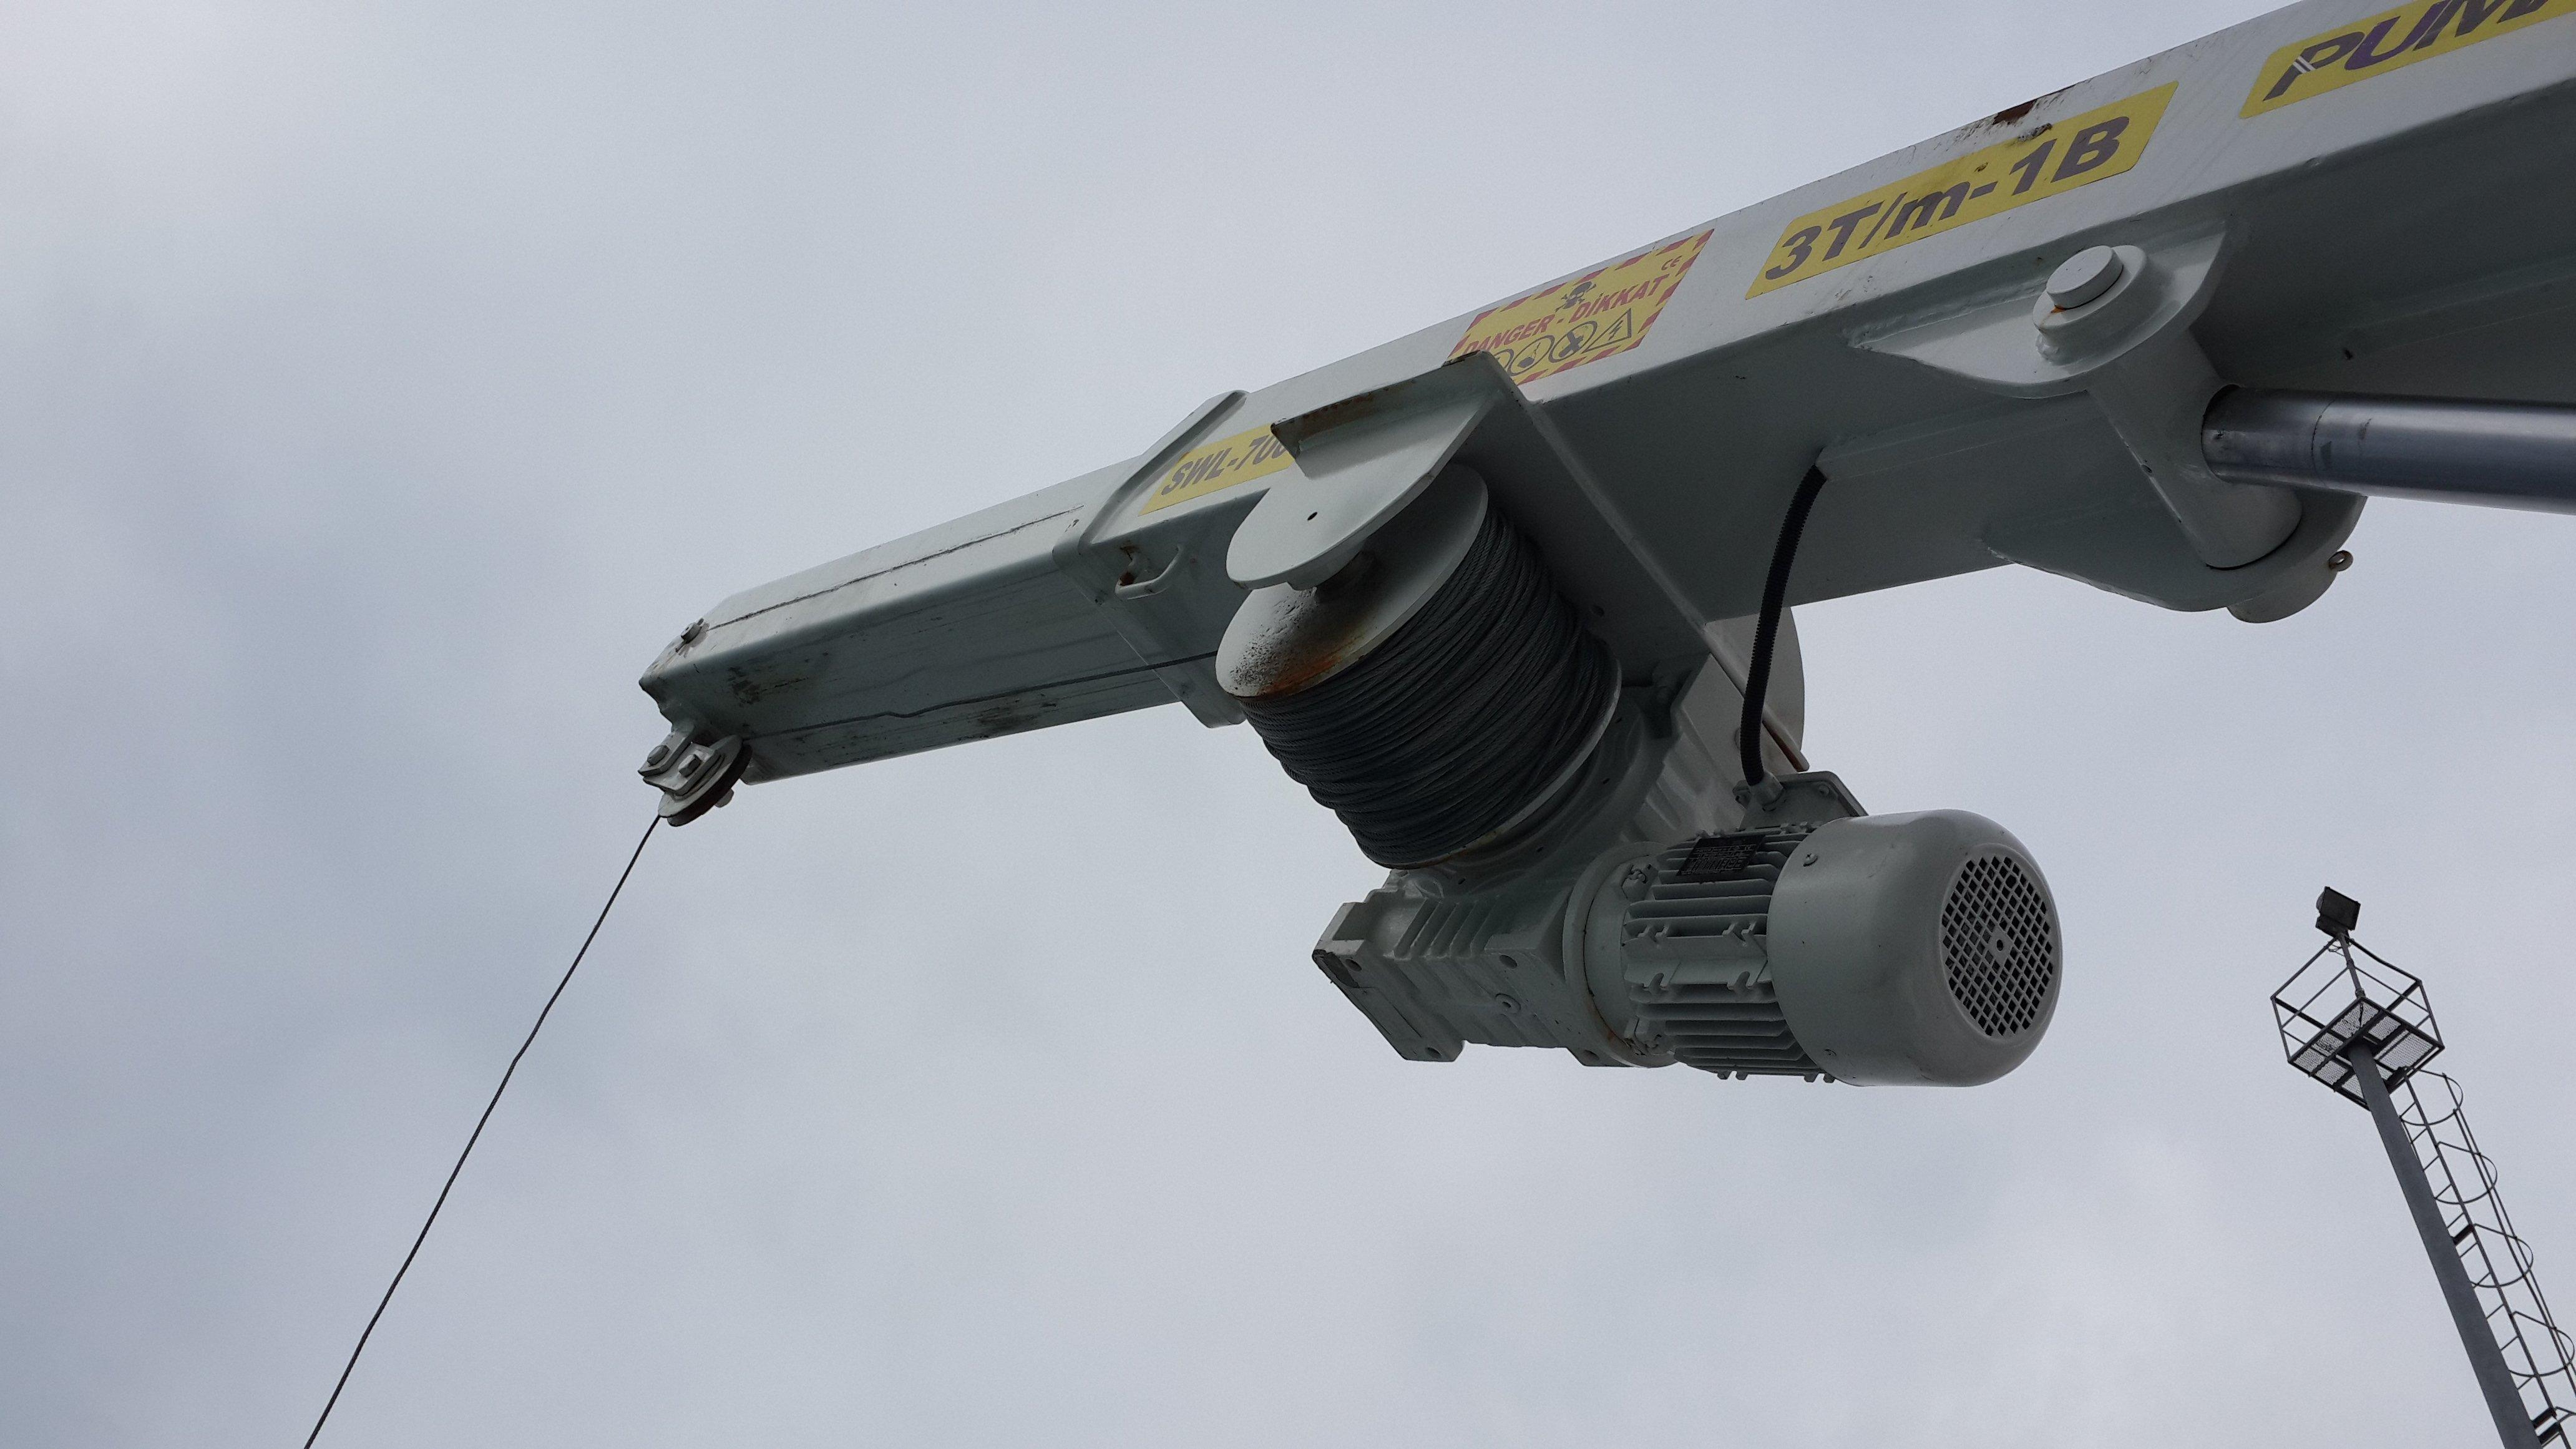 puma-marine-crane7978.jpg